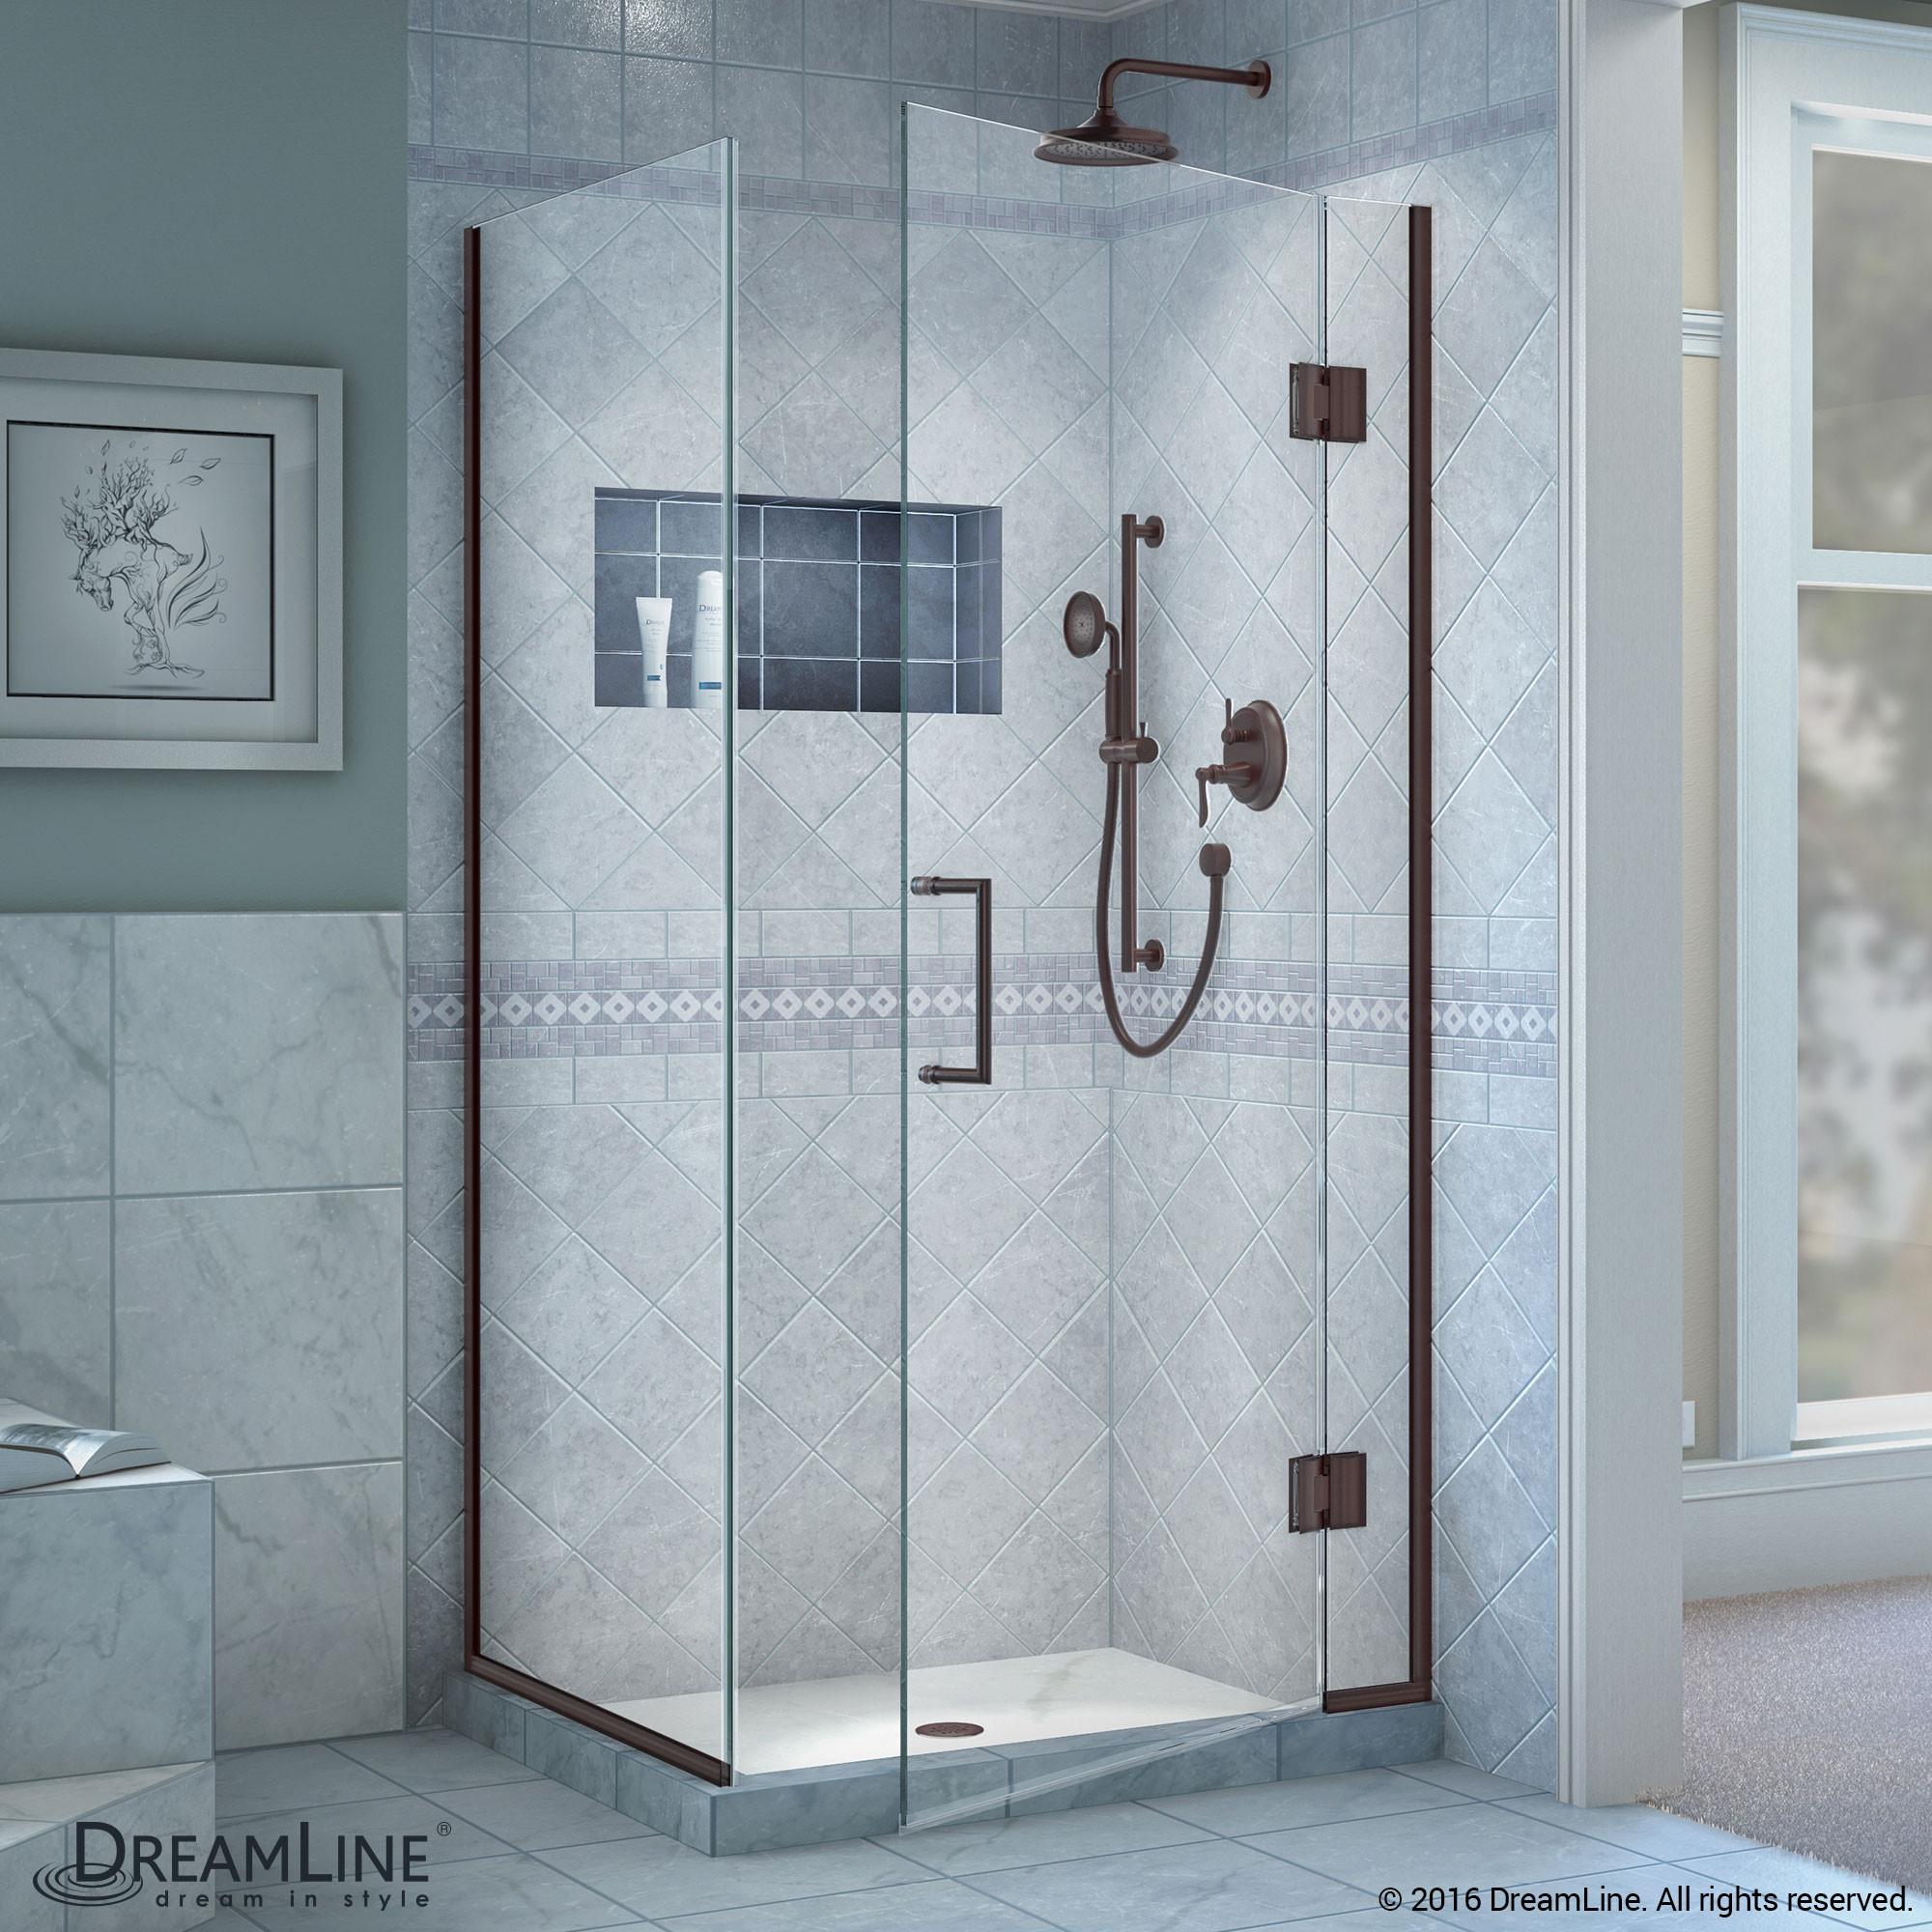 DreamLine E12930-06 Unidoor-X Hinged Shower Enclosure In Oil Rubbed Bronze Finish